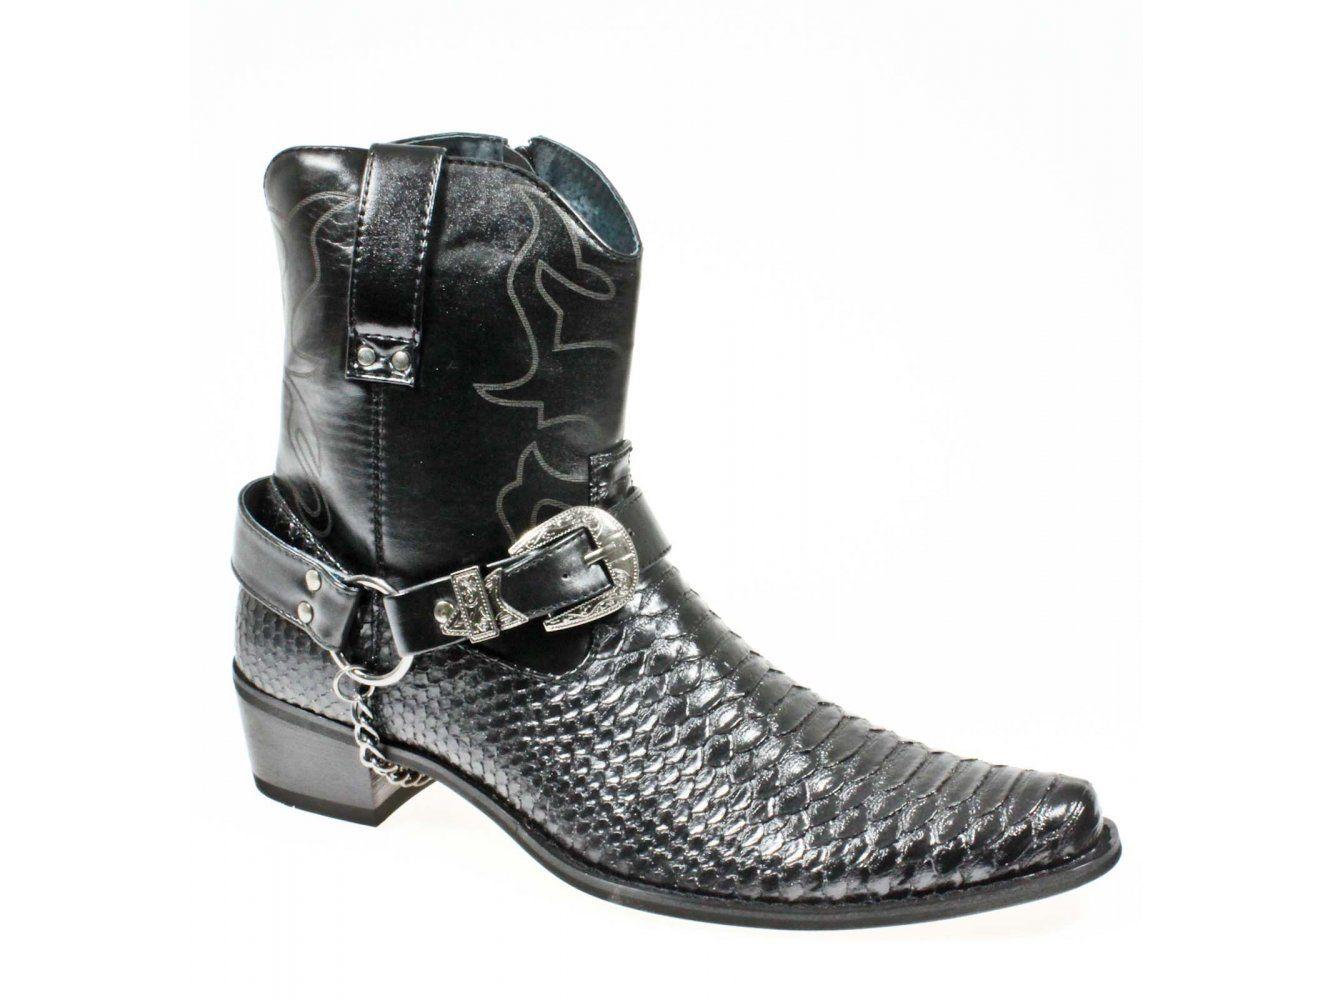 Zapatos negros Sendra Boots para hombre EvHEFrmcyy